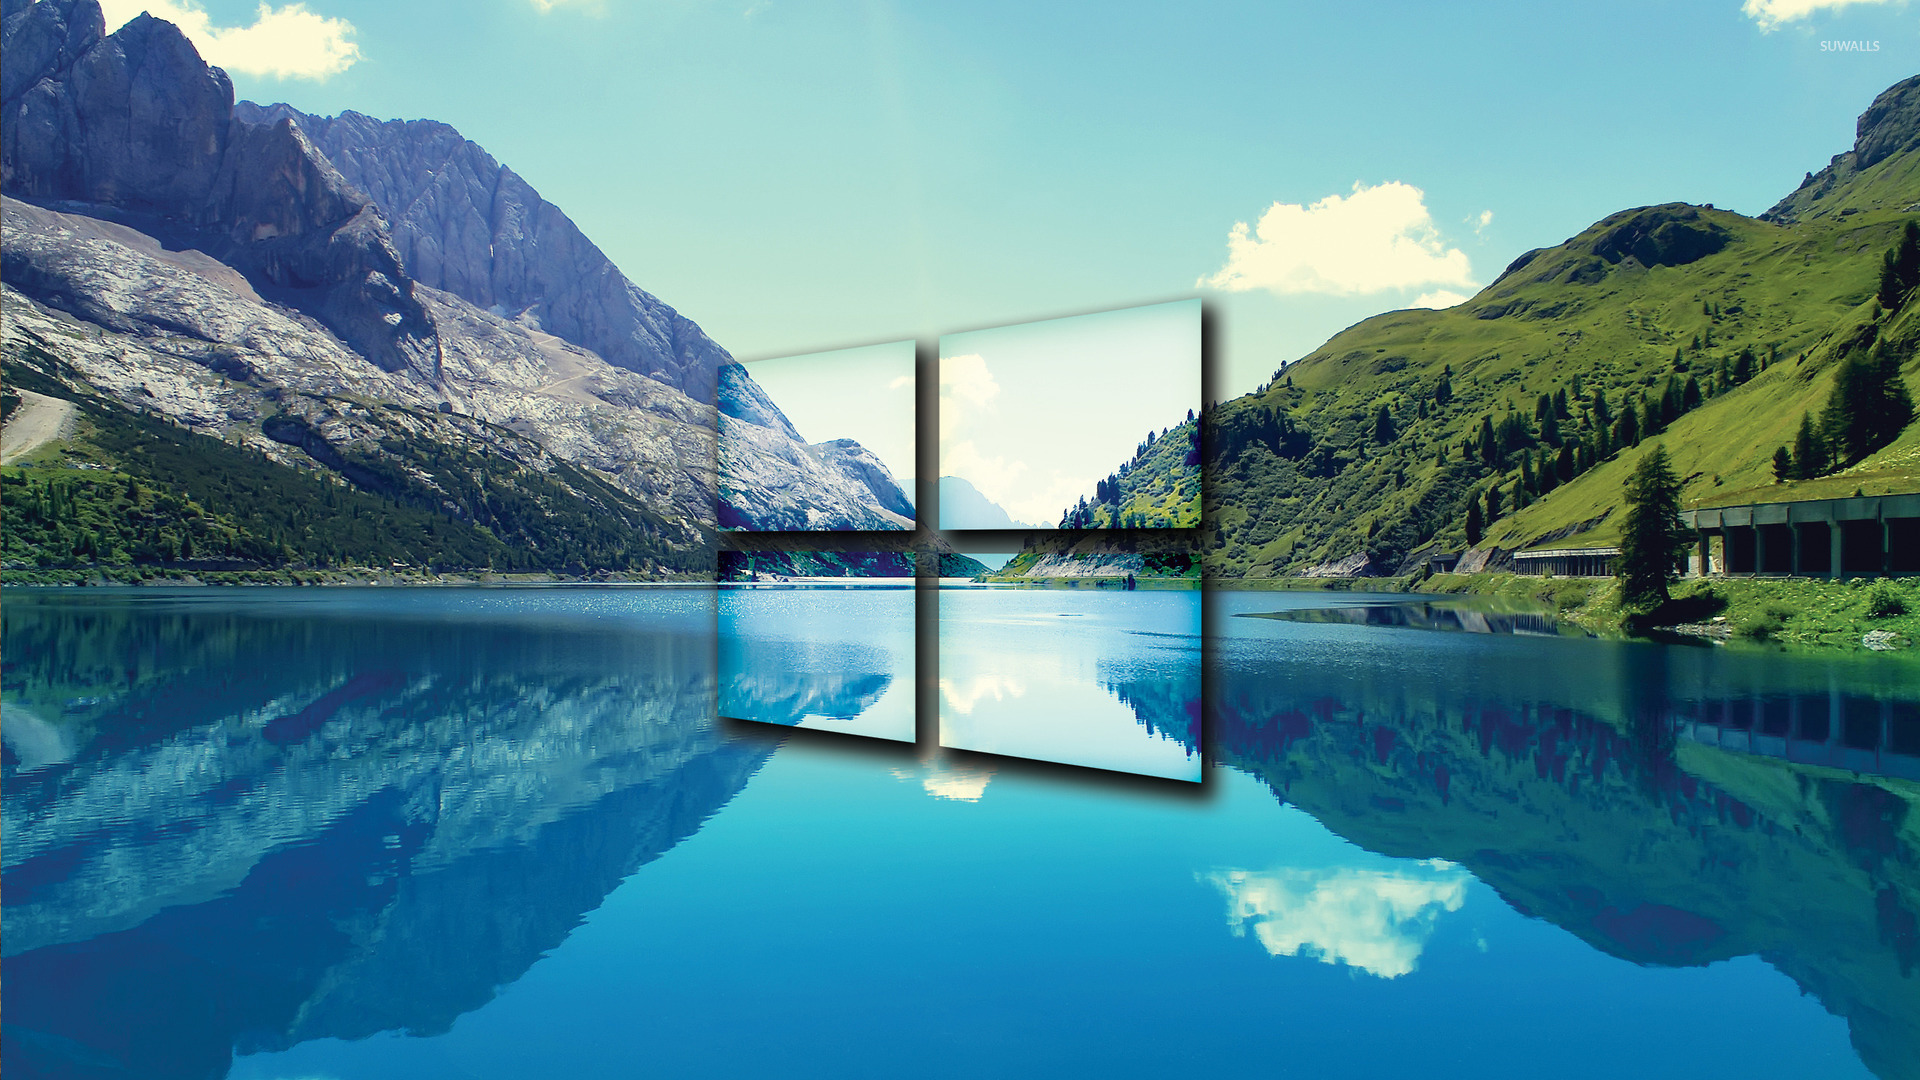 Windows 10 Wallpaper 1920x1080 - WallpaperSafari